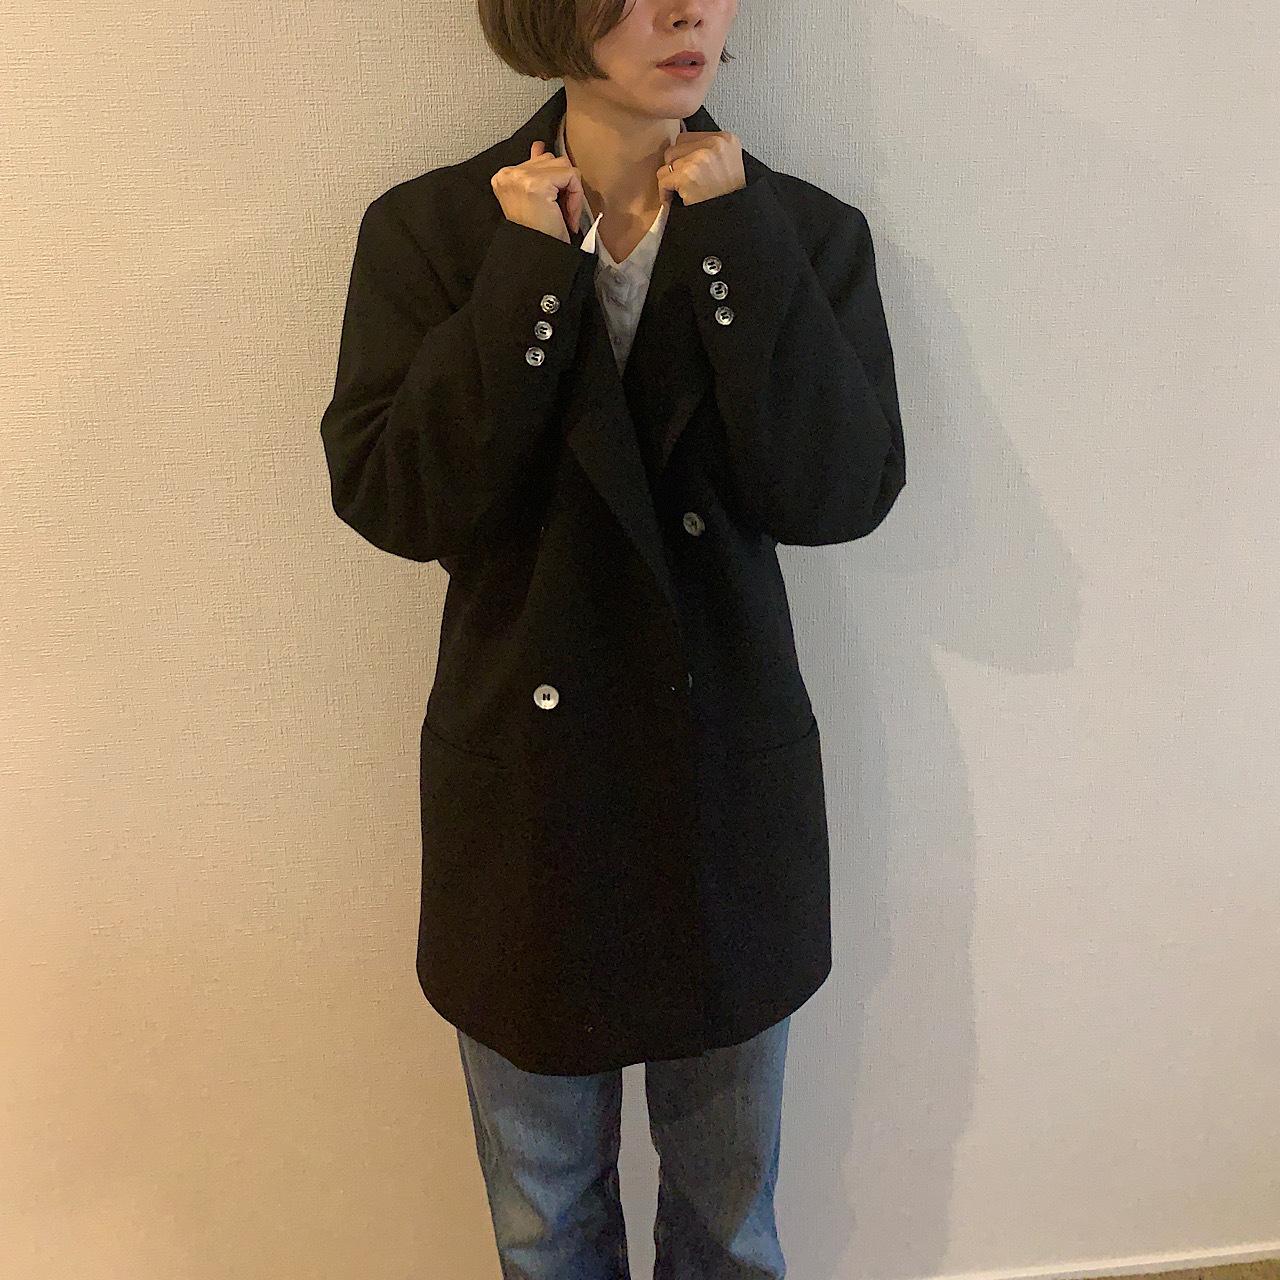 【送料無料】 Vintage black jacket